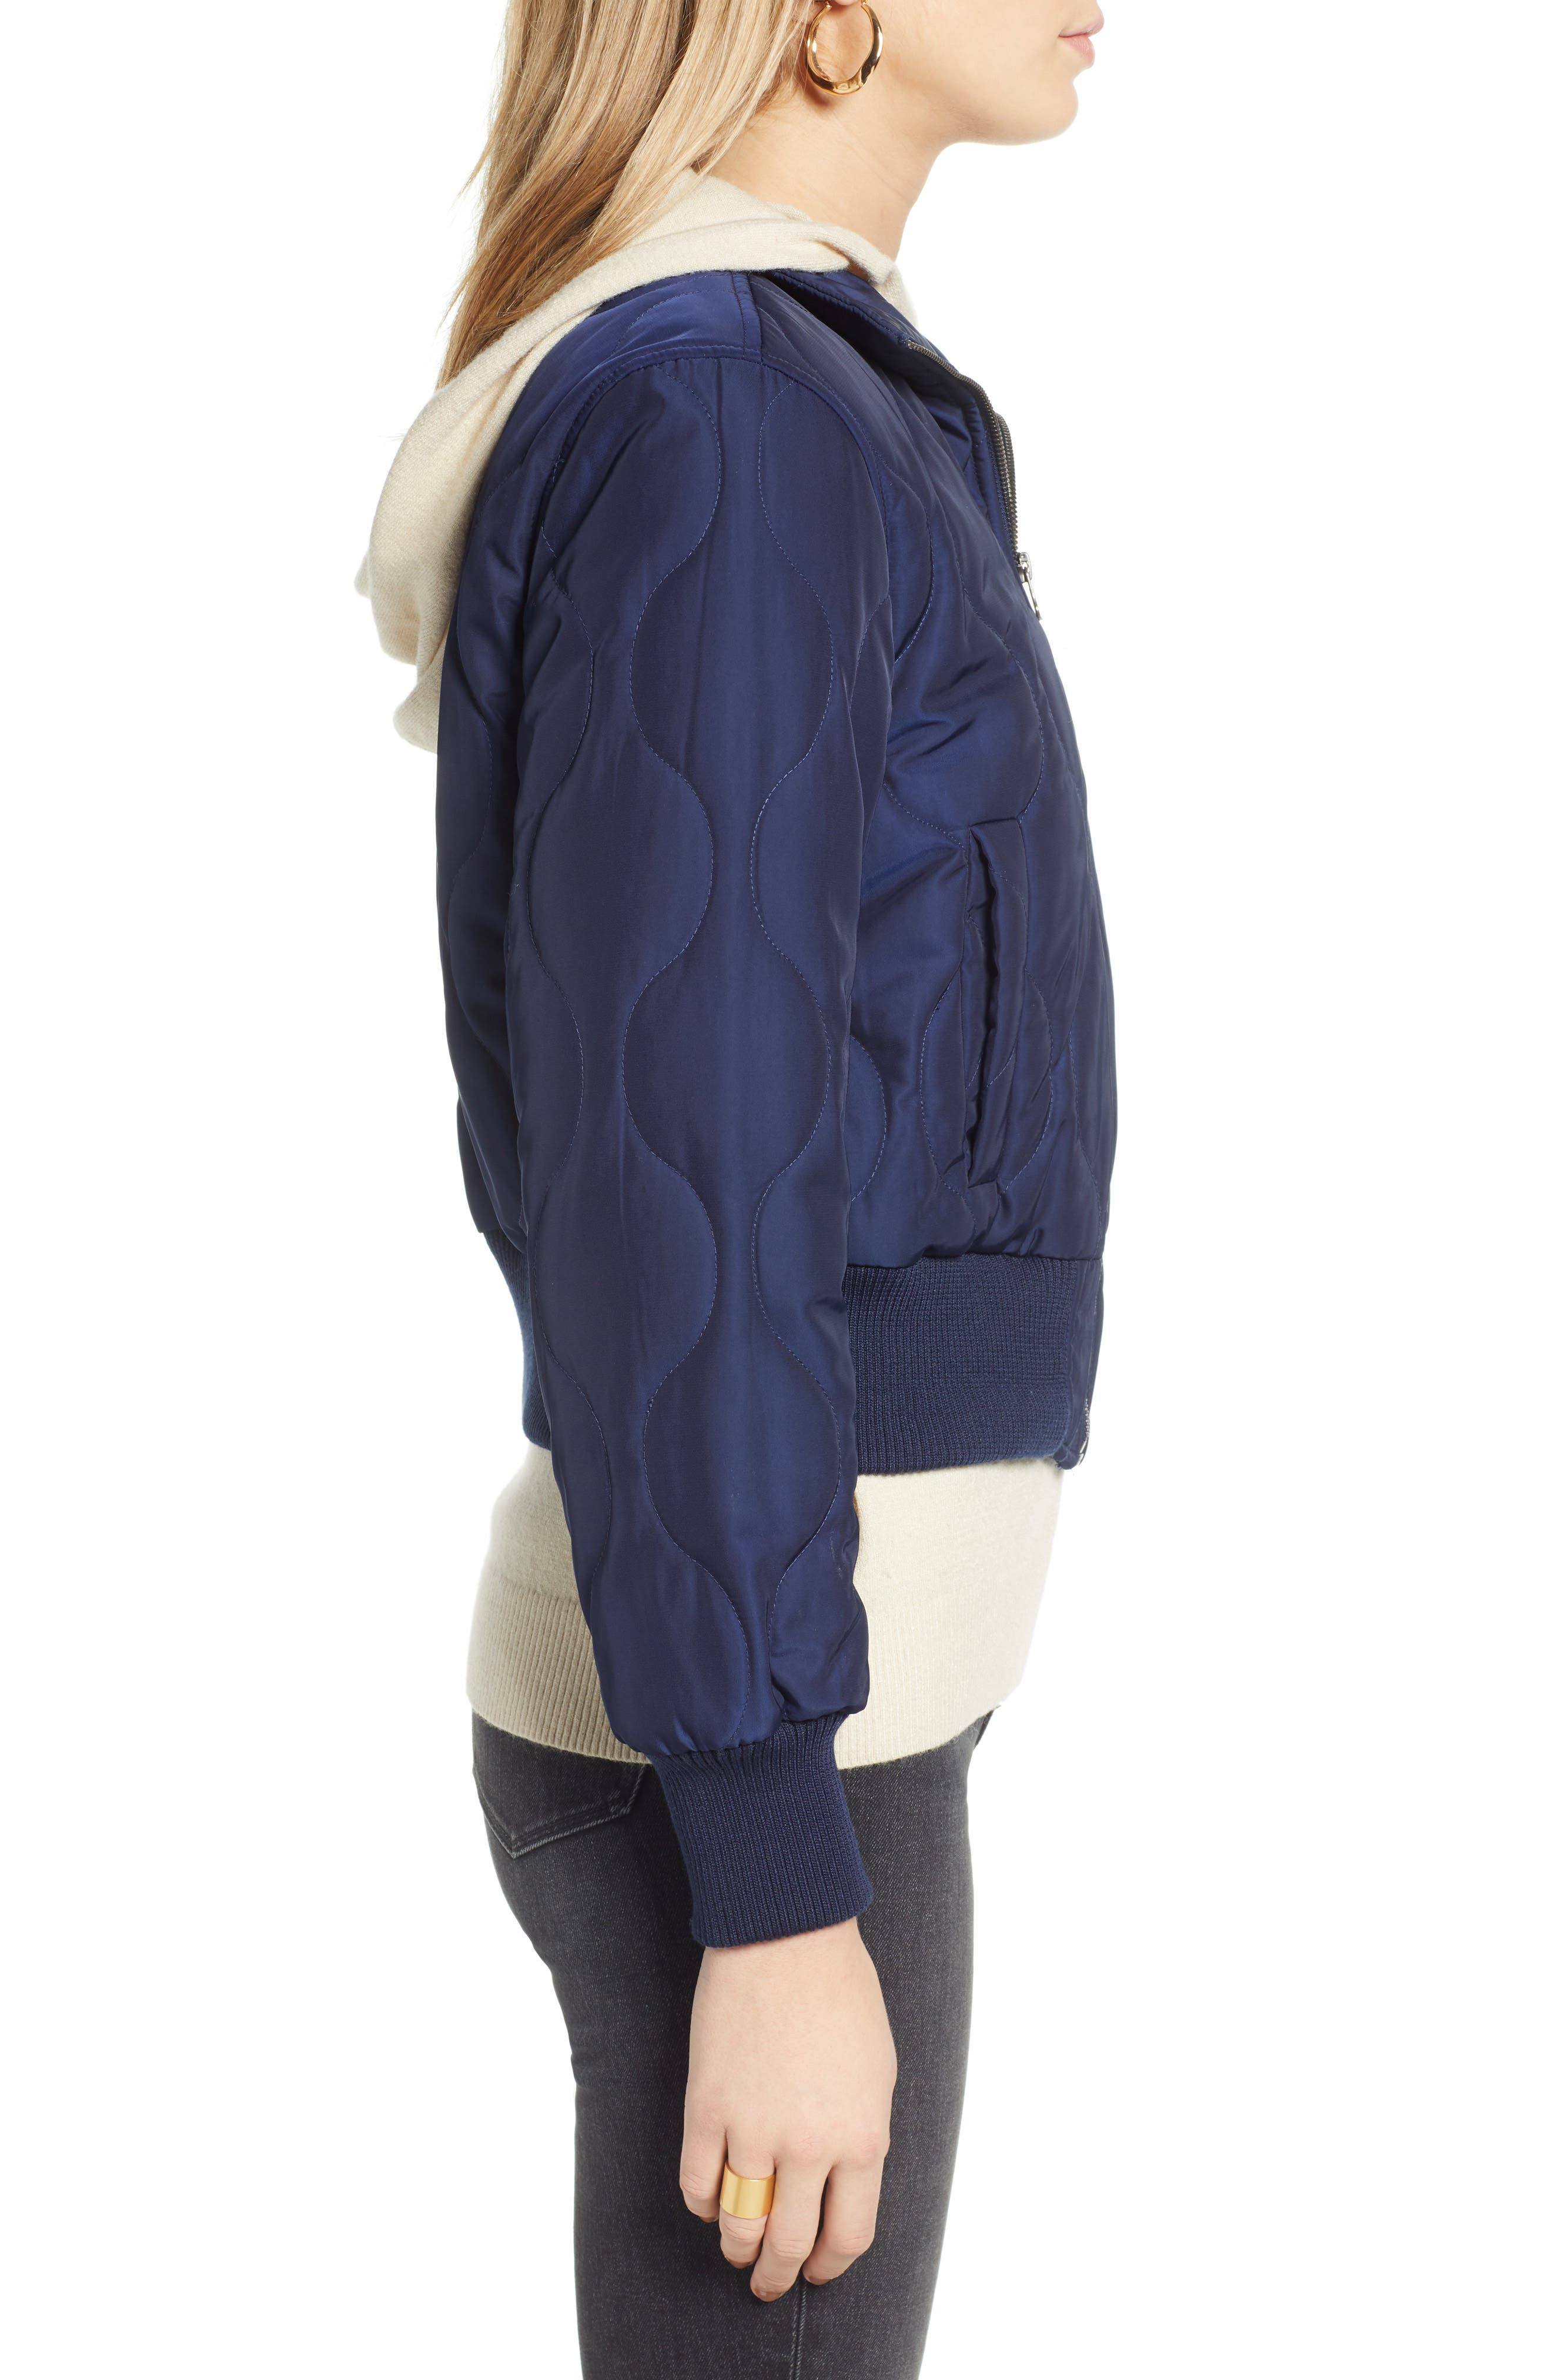 TREASURE & BOND, Satin Crop Puffer Jacket, Alternate thumbnail 4, color, NAVY MARITIME